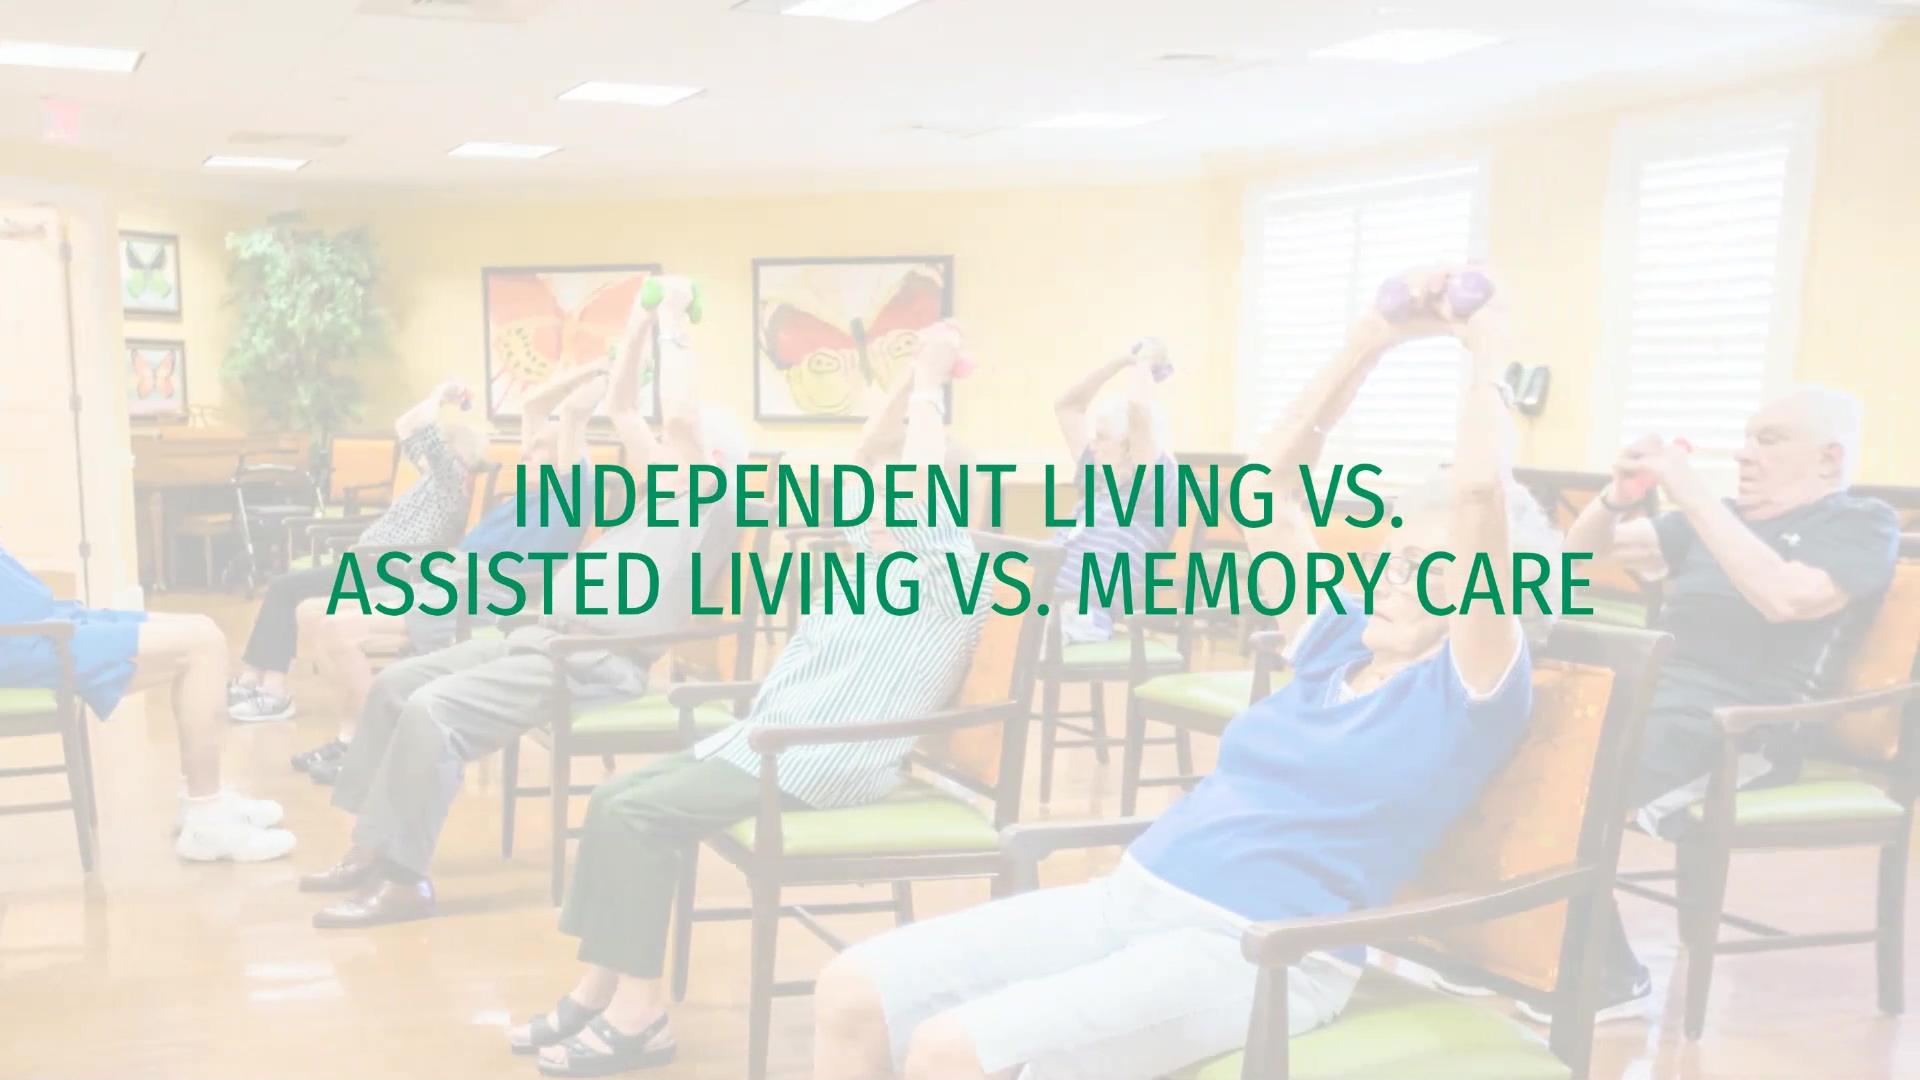 Cedarhurst_INDEPENDENT LIVING VS. ASSISTED LIVING VS. MEMORY CARE_video